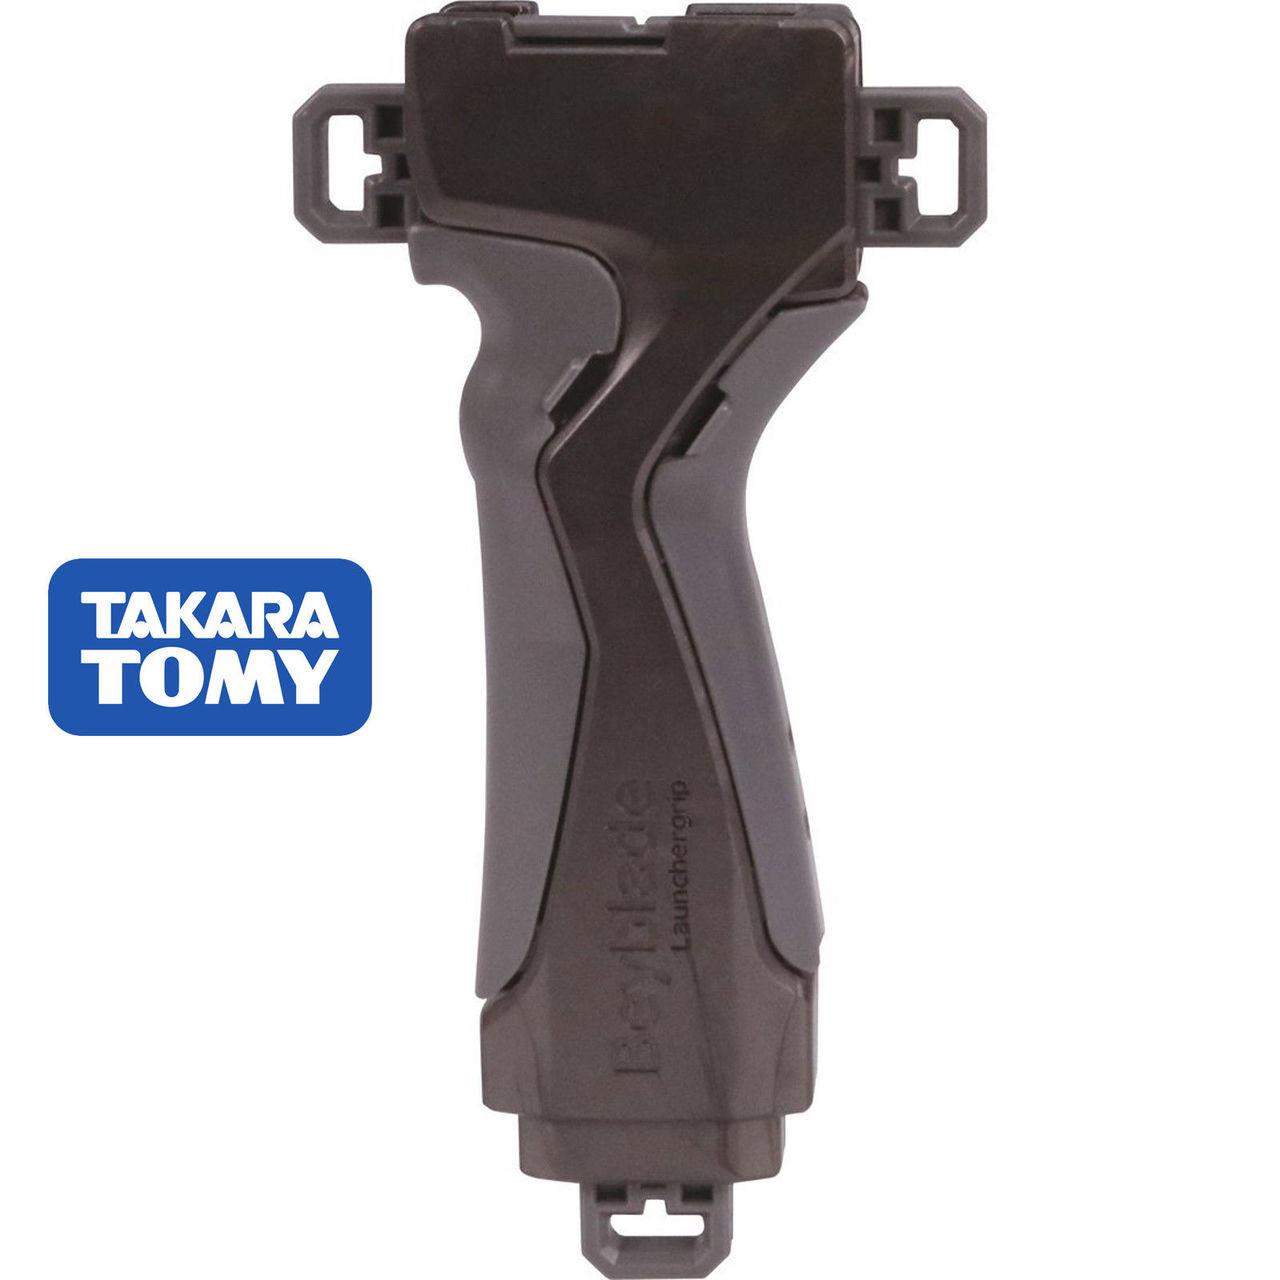 Takara Tomy Beyblade Burst Starter Set Launcher Pack or Grip Bey Launcher